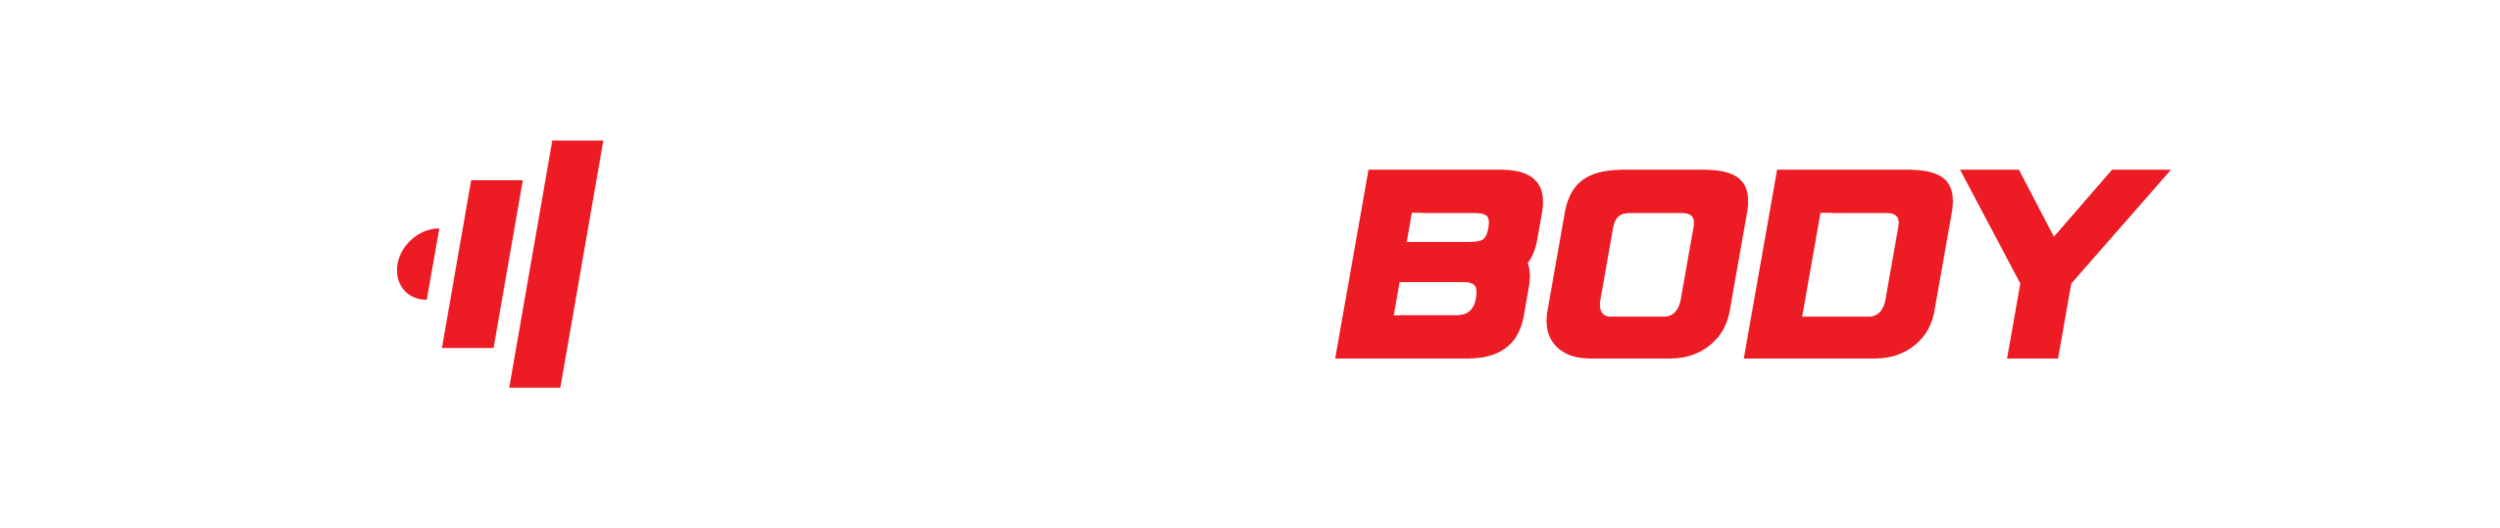 Modbody_Logo-full_2016_Secondary.png